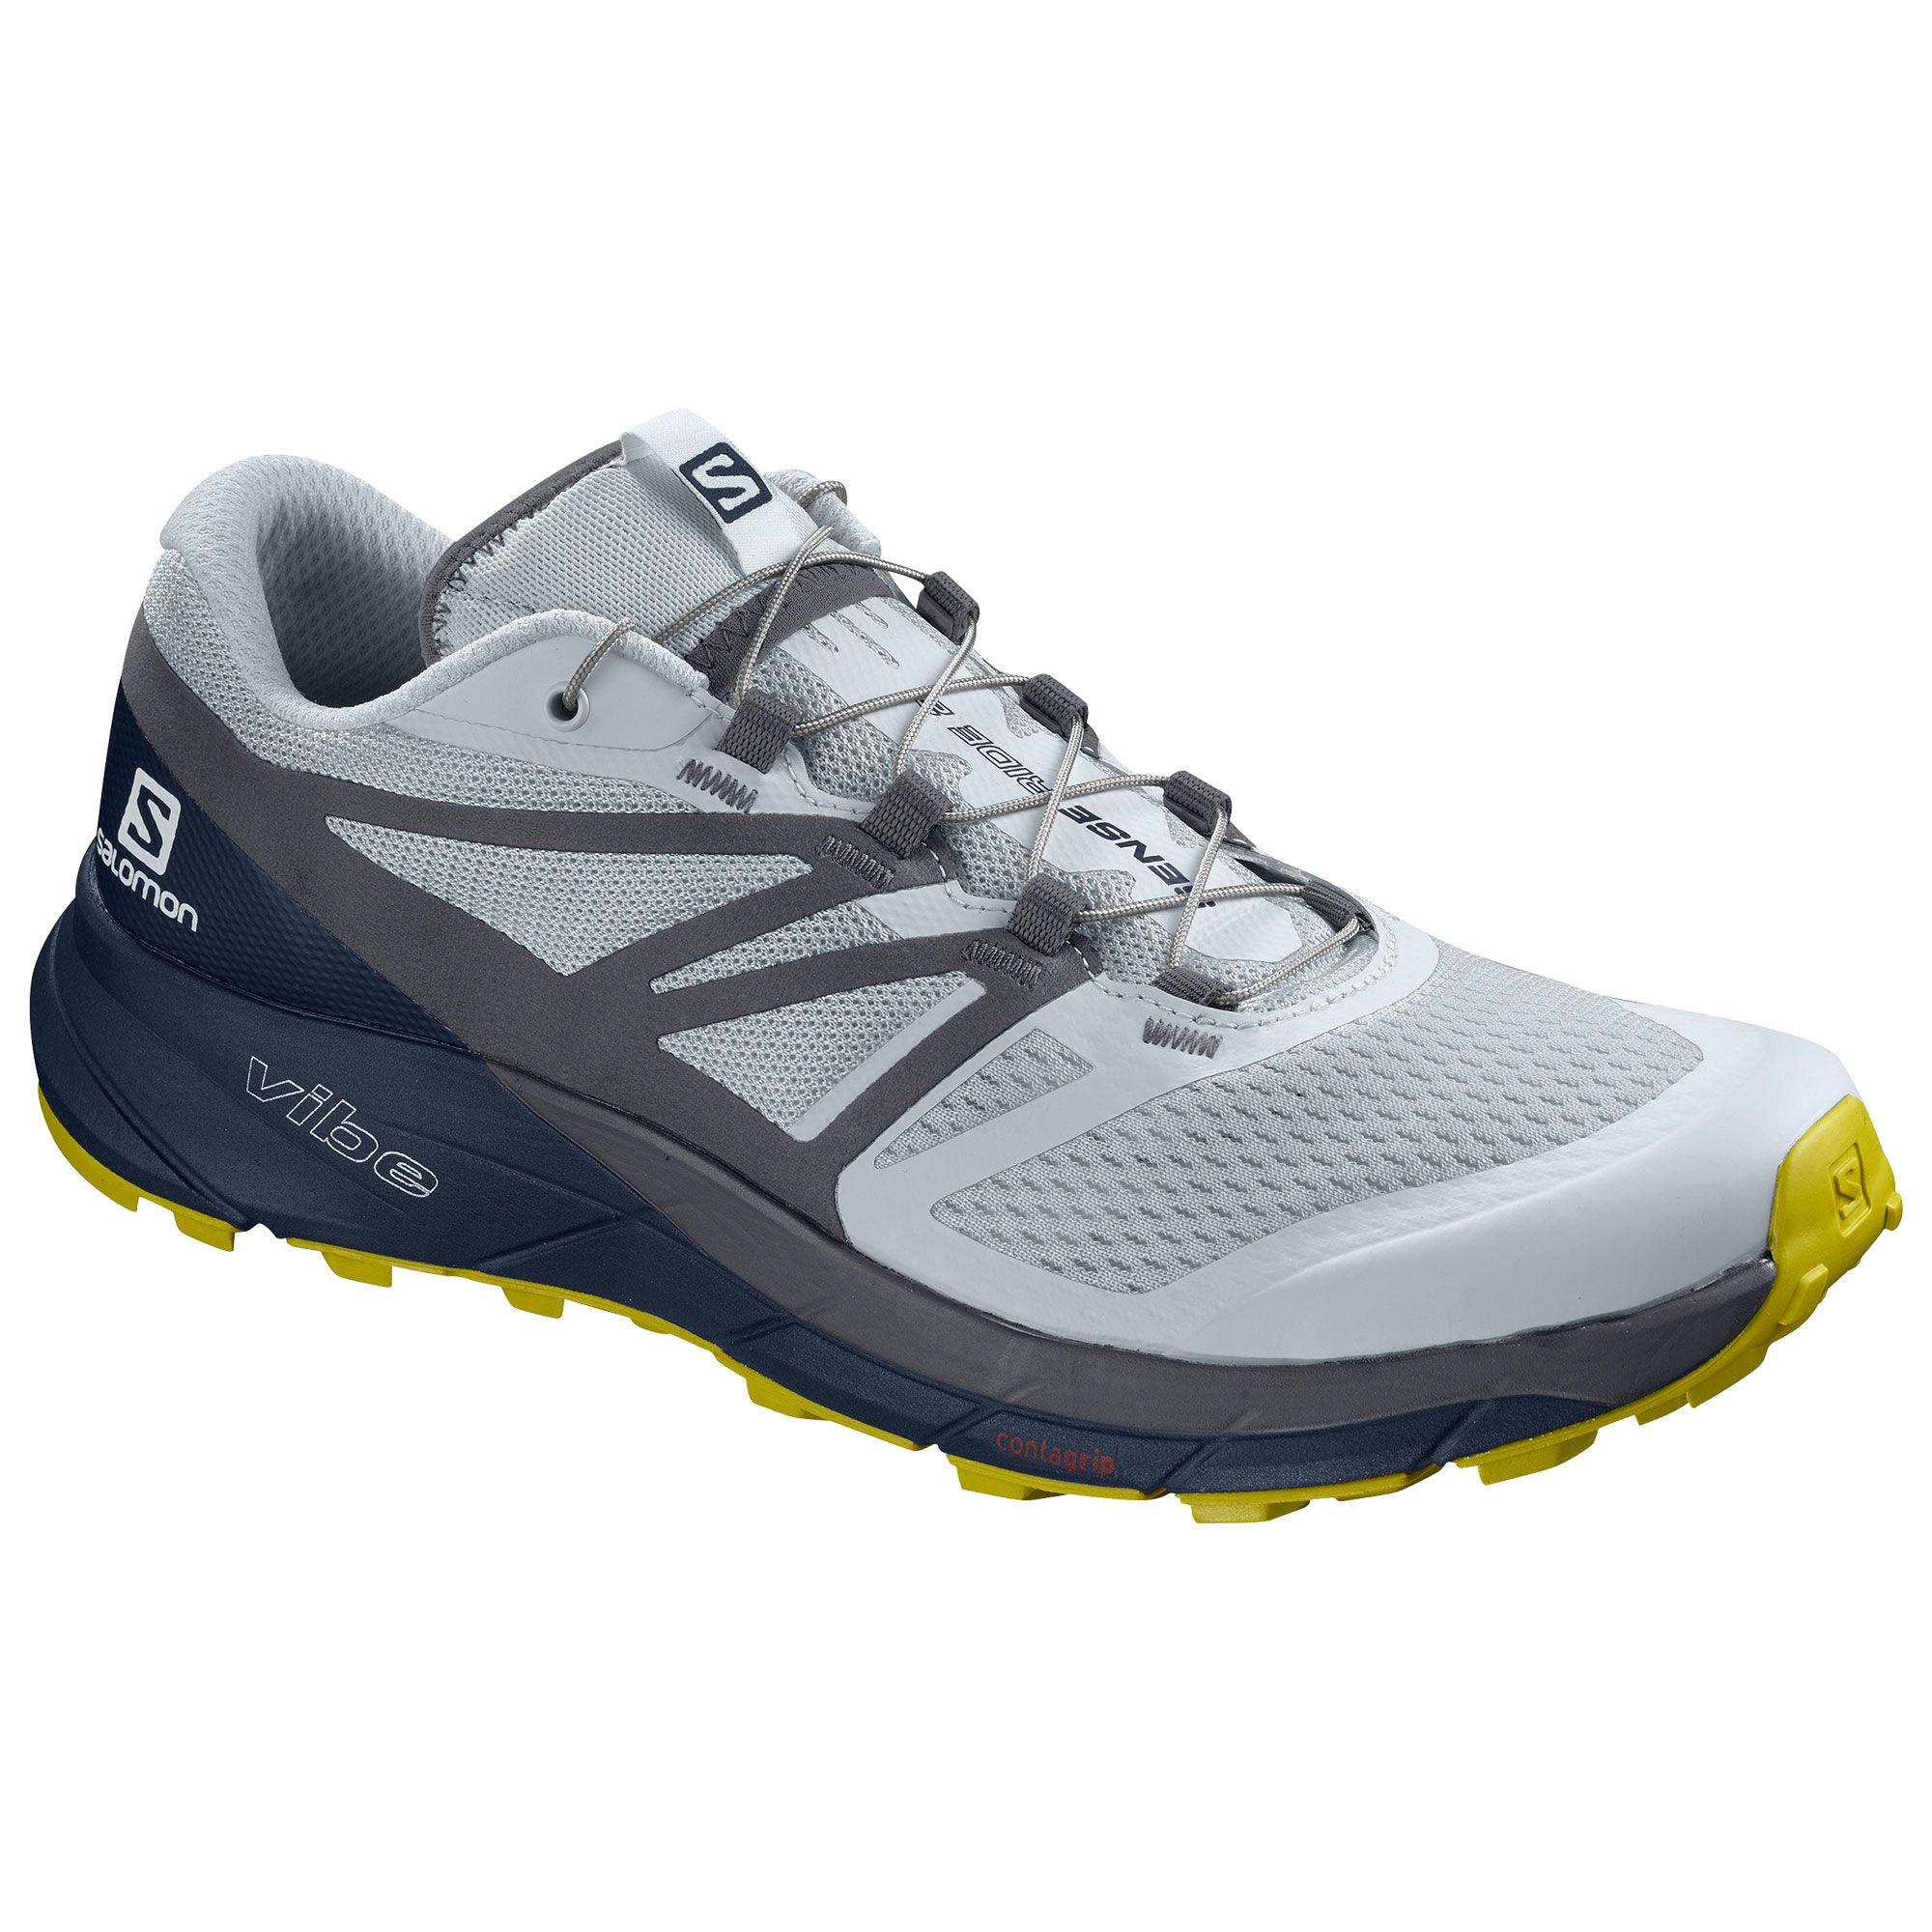 Sense Ride 2 Mens Trail Running Shoes Sneakers Running Shoes Sneakers